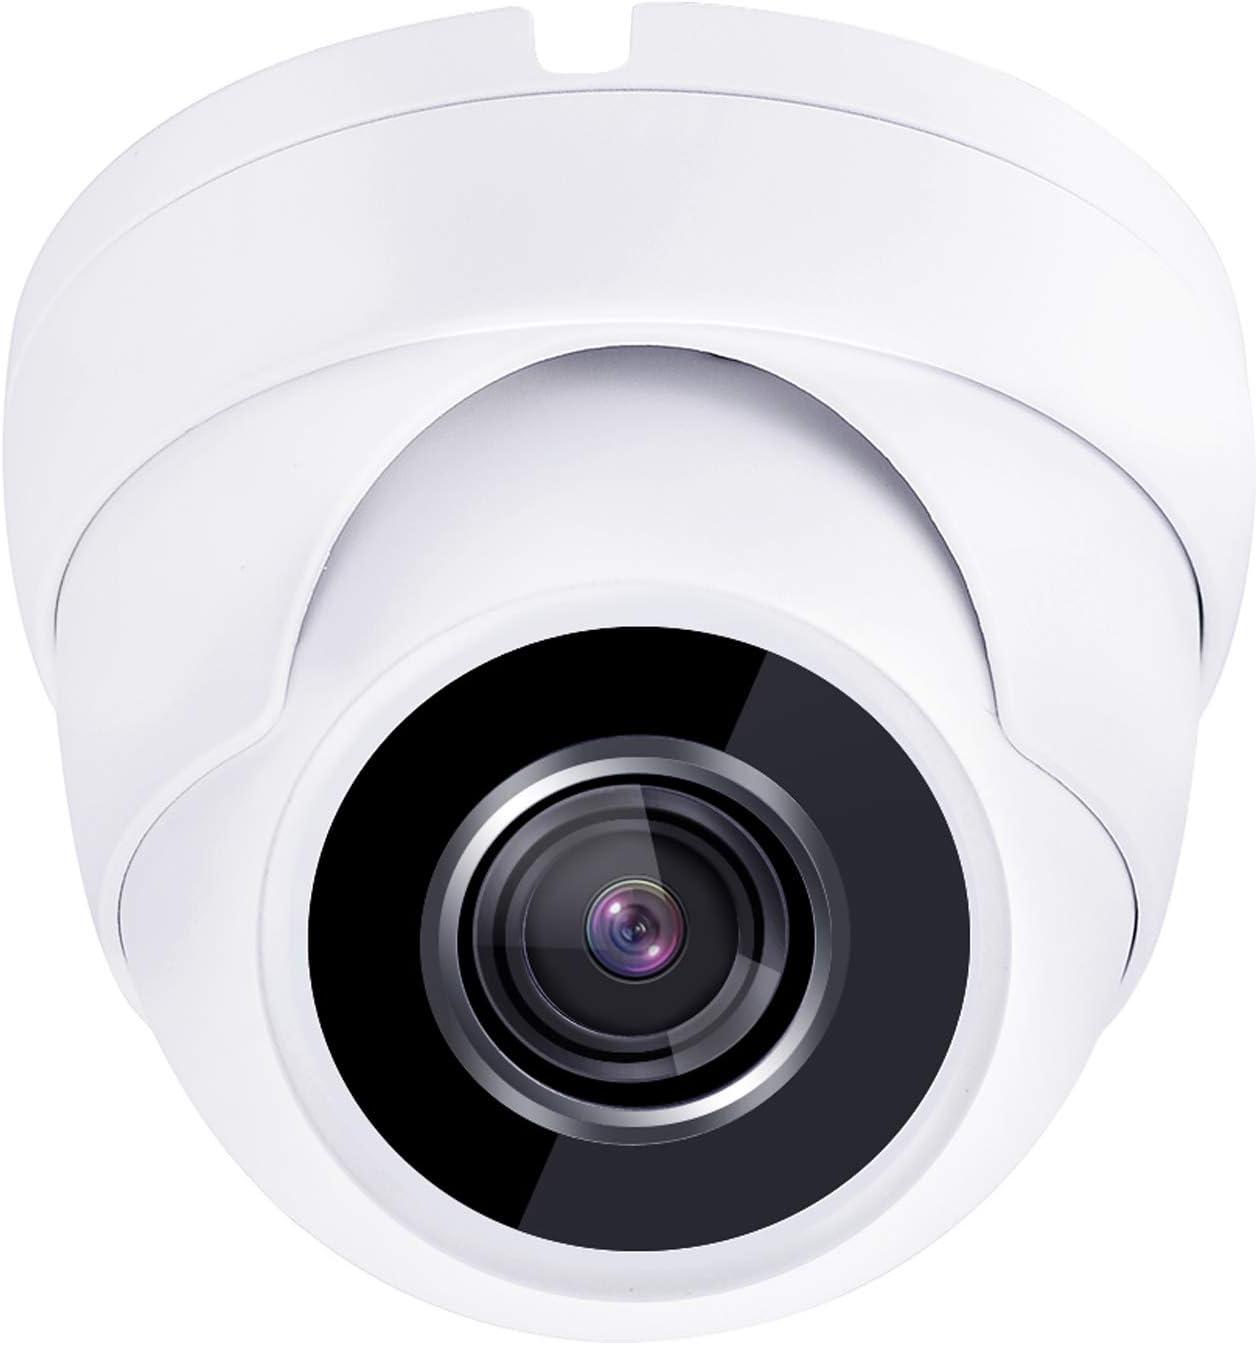 1080P HD Security Camera 3.6mm Fixed Lens Dome HD TVI CVI AHD Analog CVBS Black